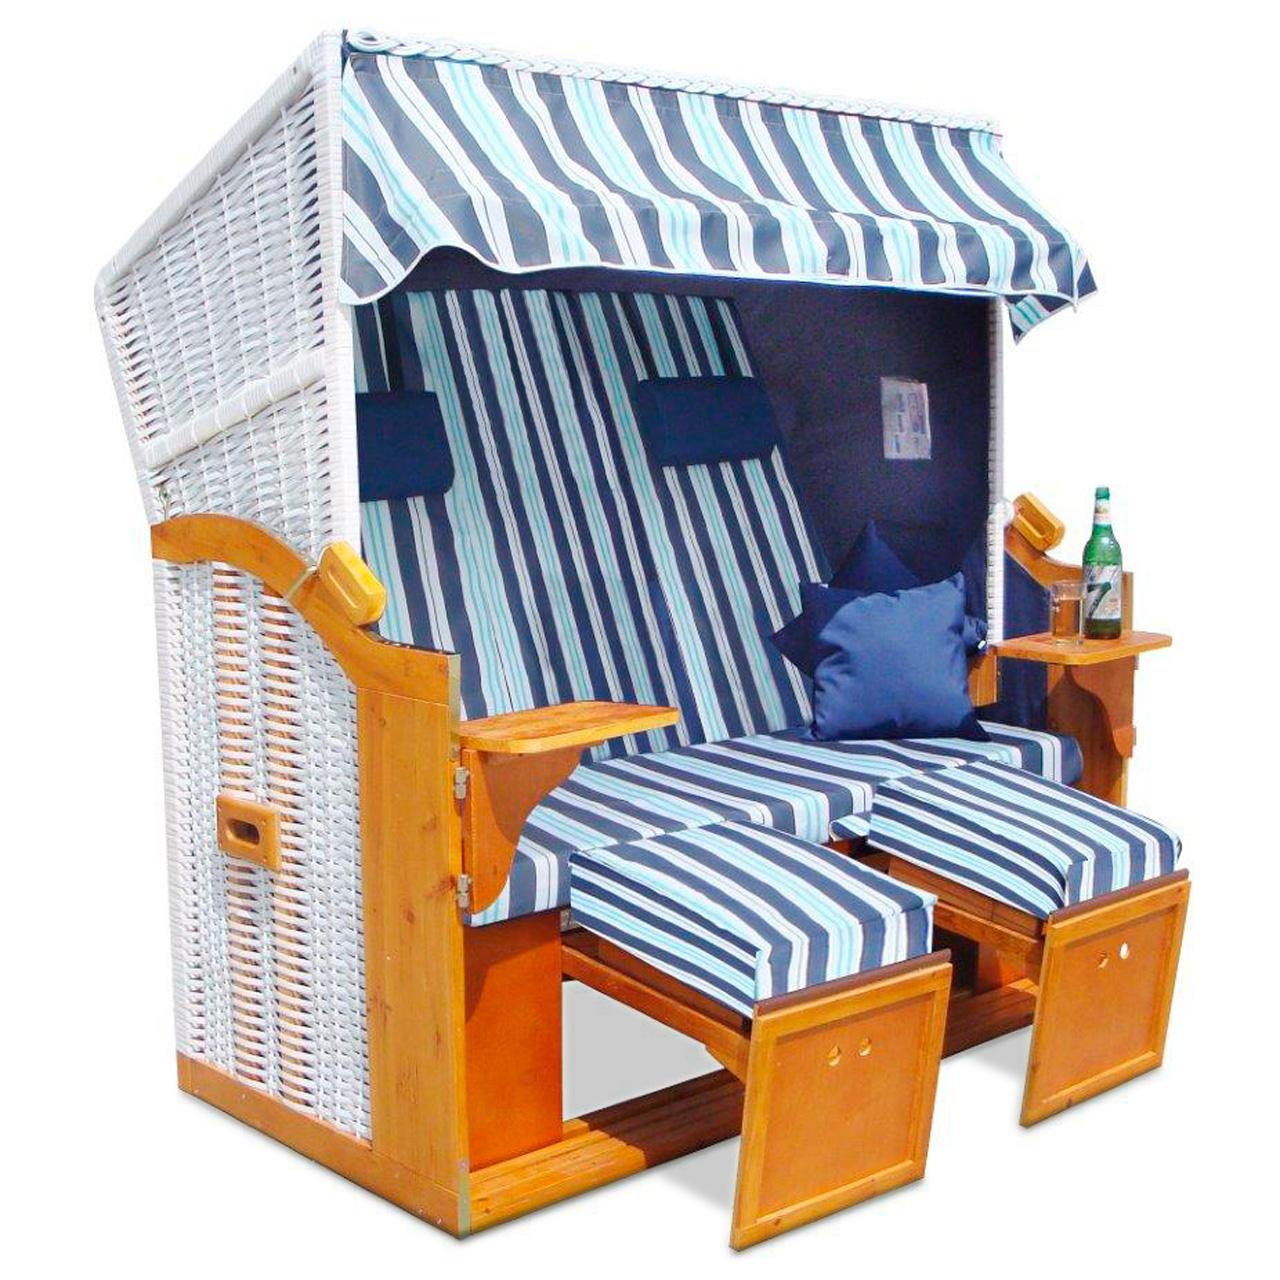 strandkorb xxl volllieger ostsee gartenliege sonneninsel rattan m bel neu ebay. Black Bedroom Furniture Sets. Home Design Ideas